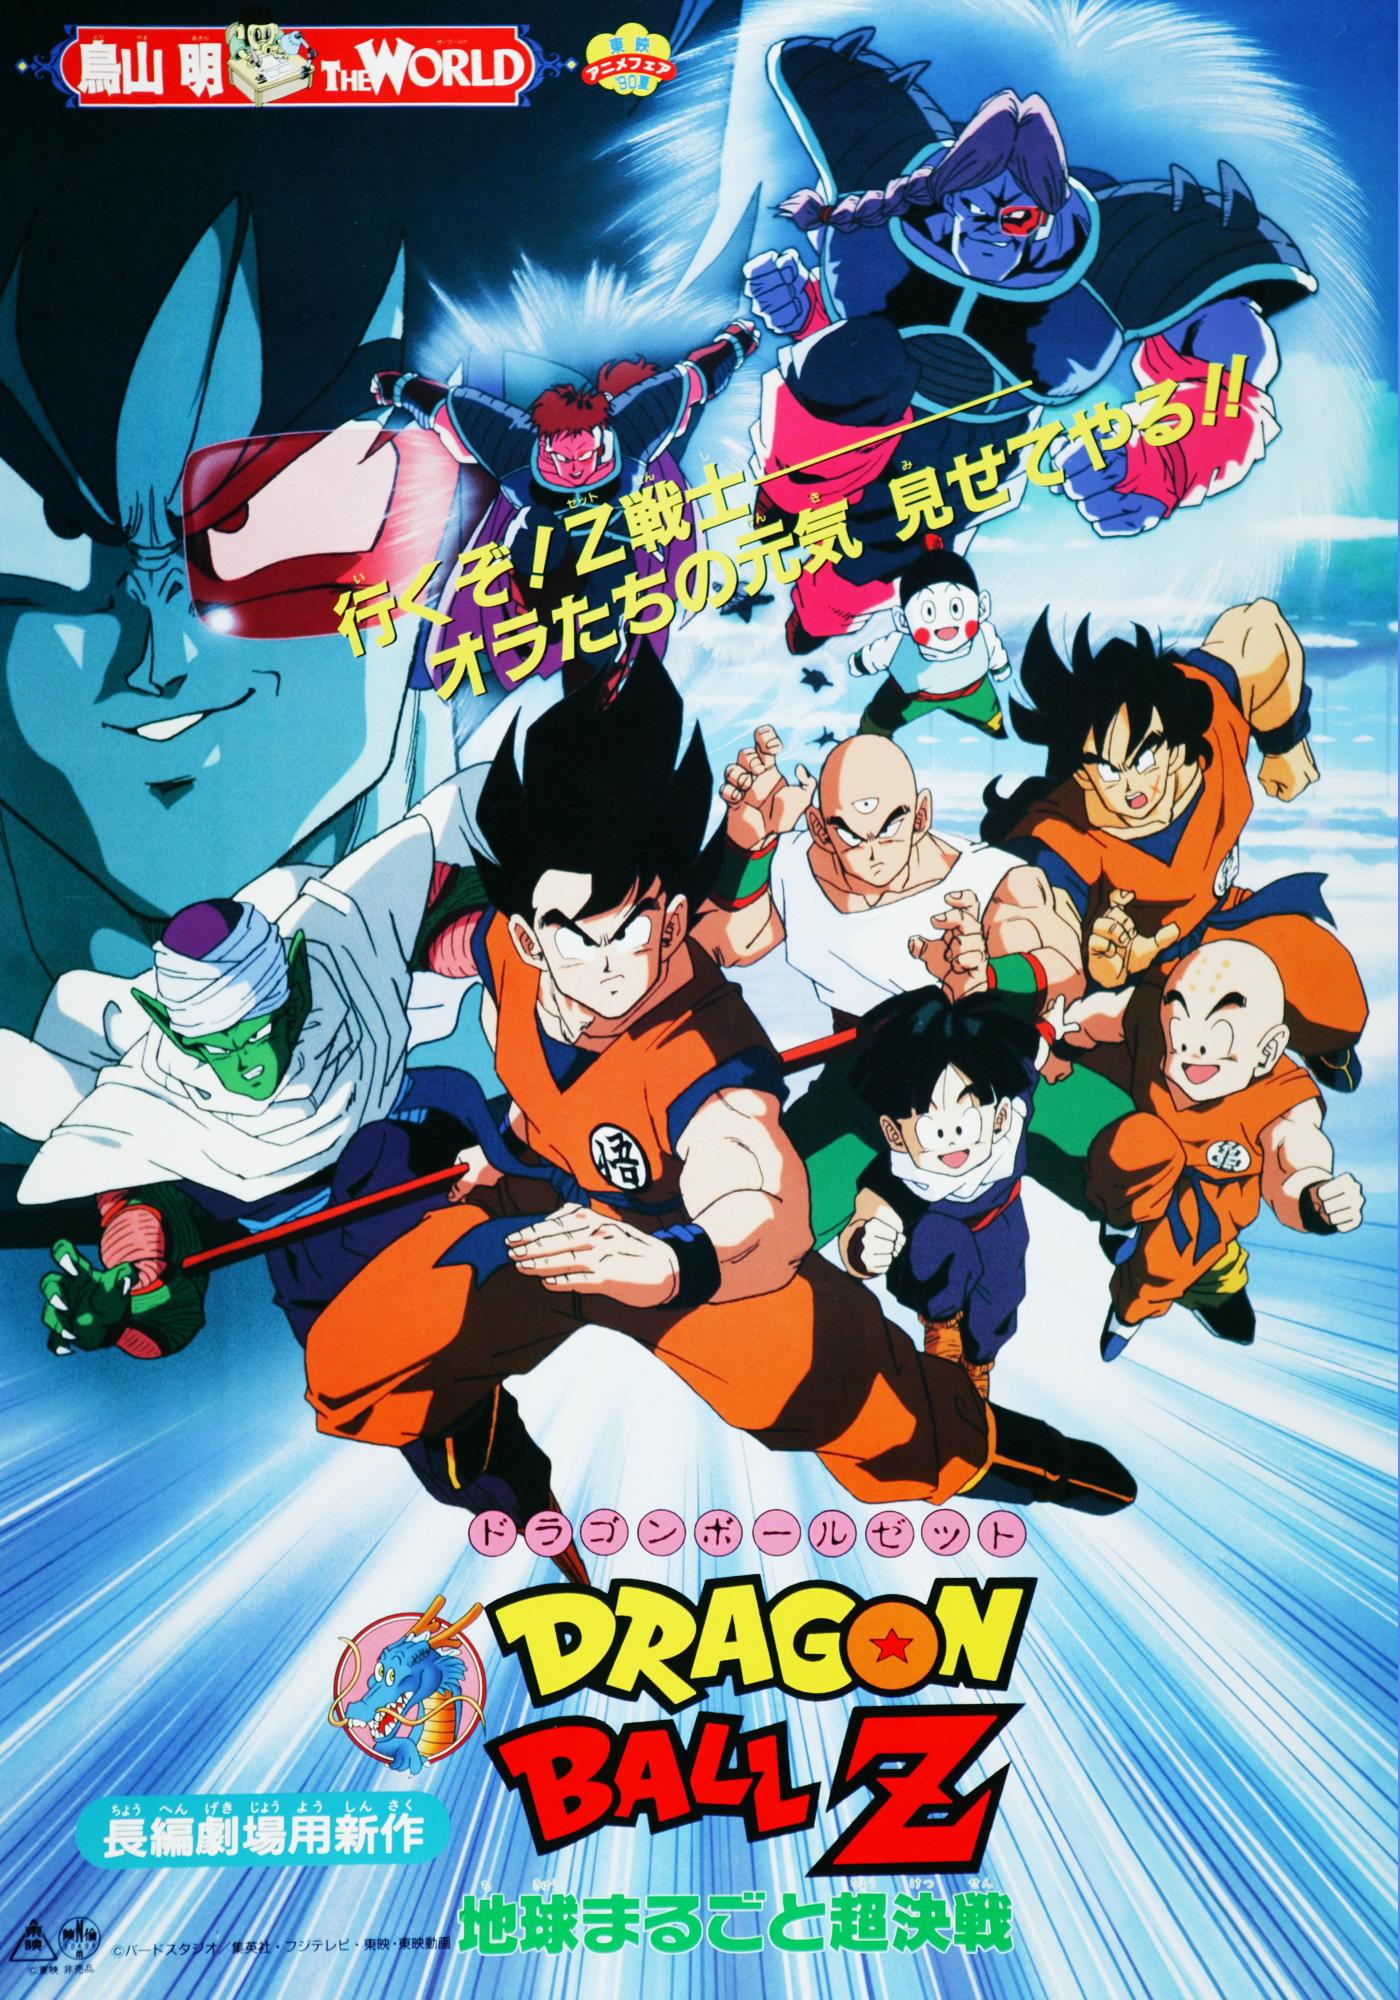 Dragonball Z Film